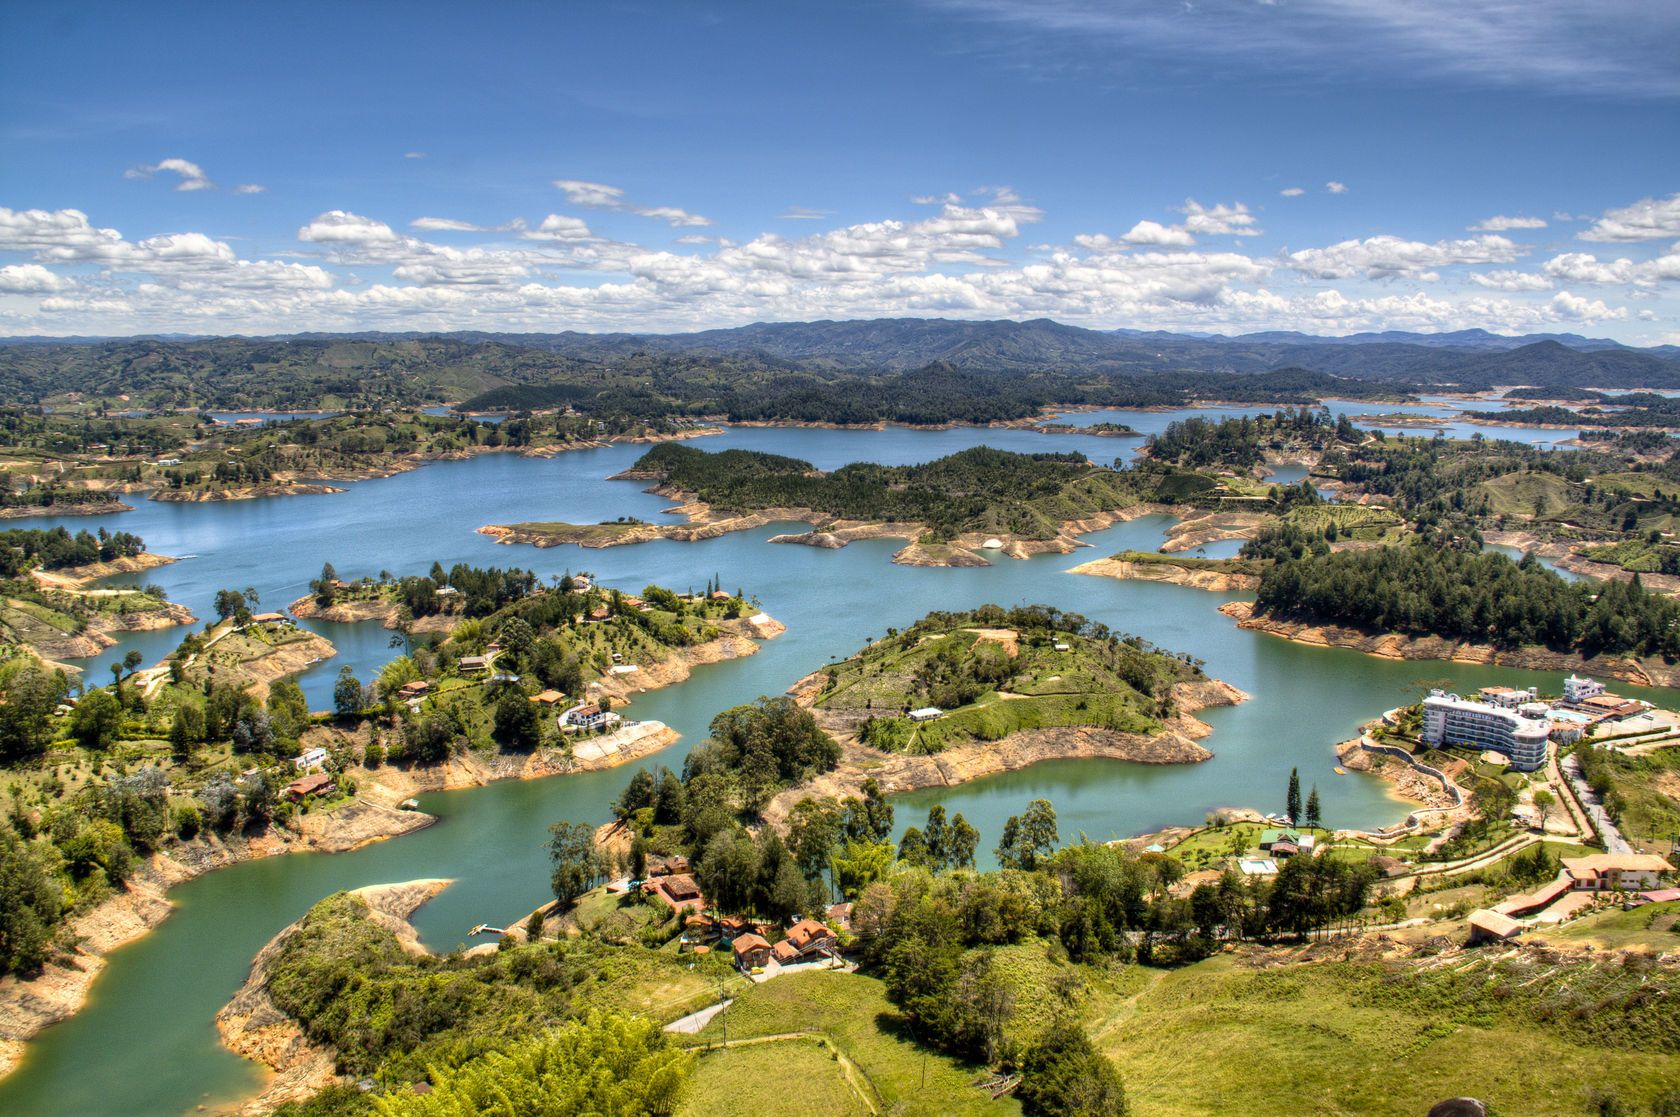 Krajina v jihoamerické Kolumbii | waldorf27/123RF.com